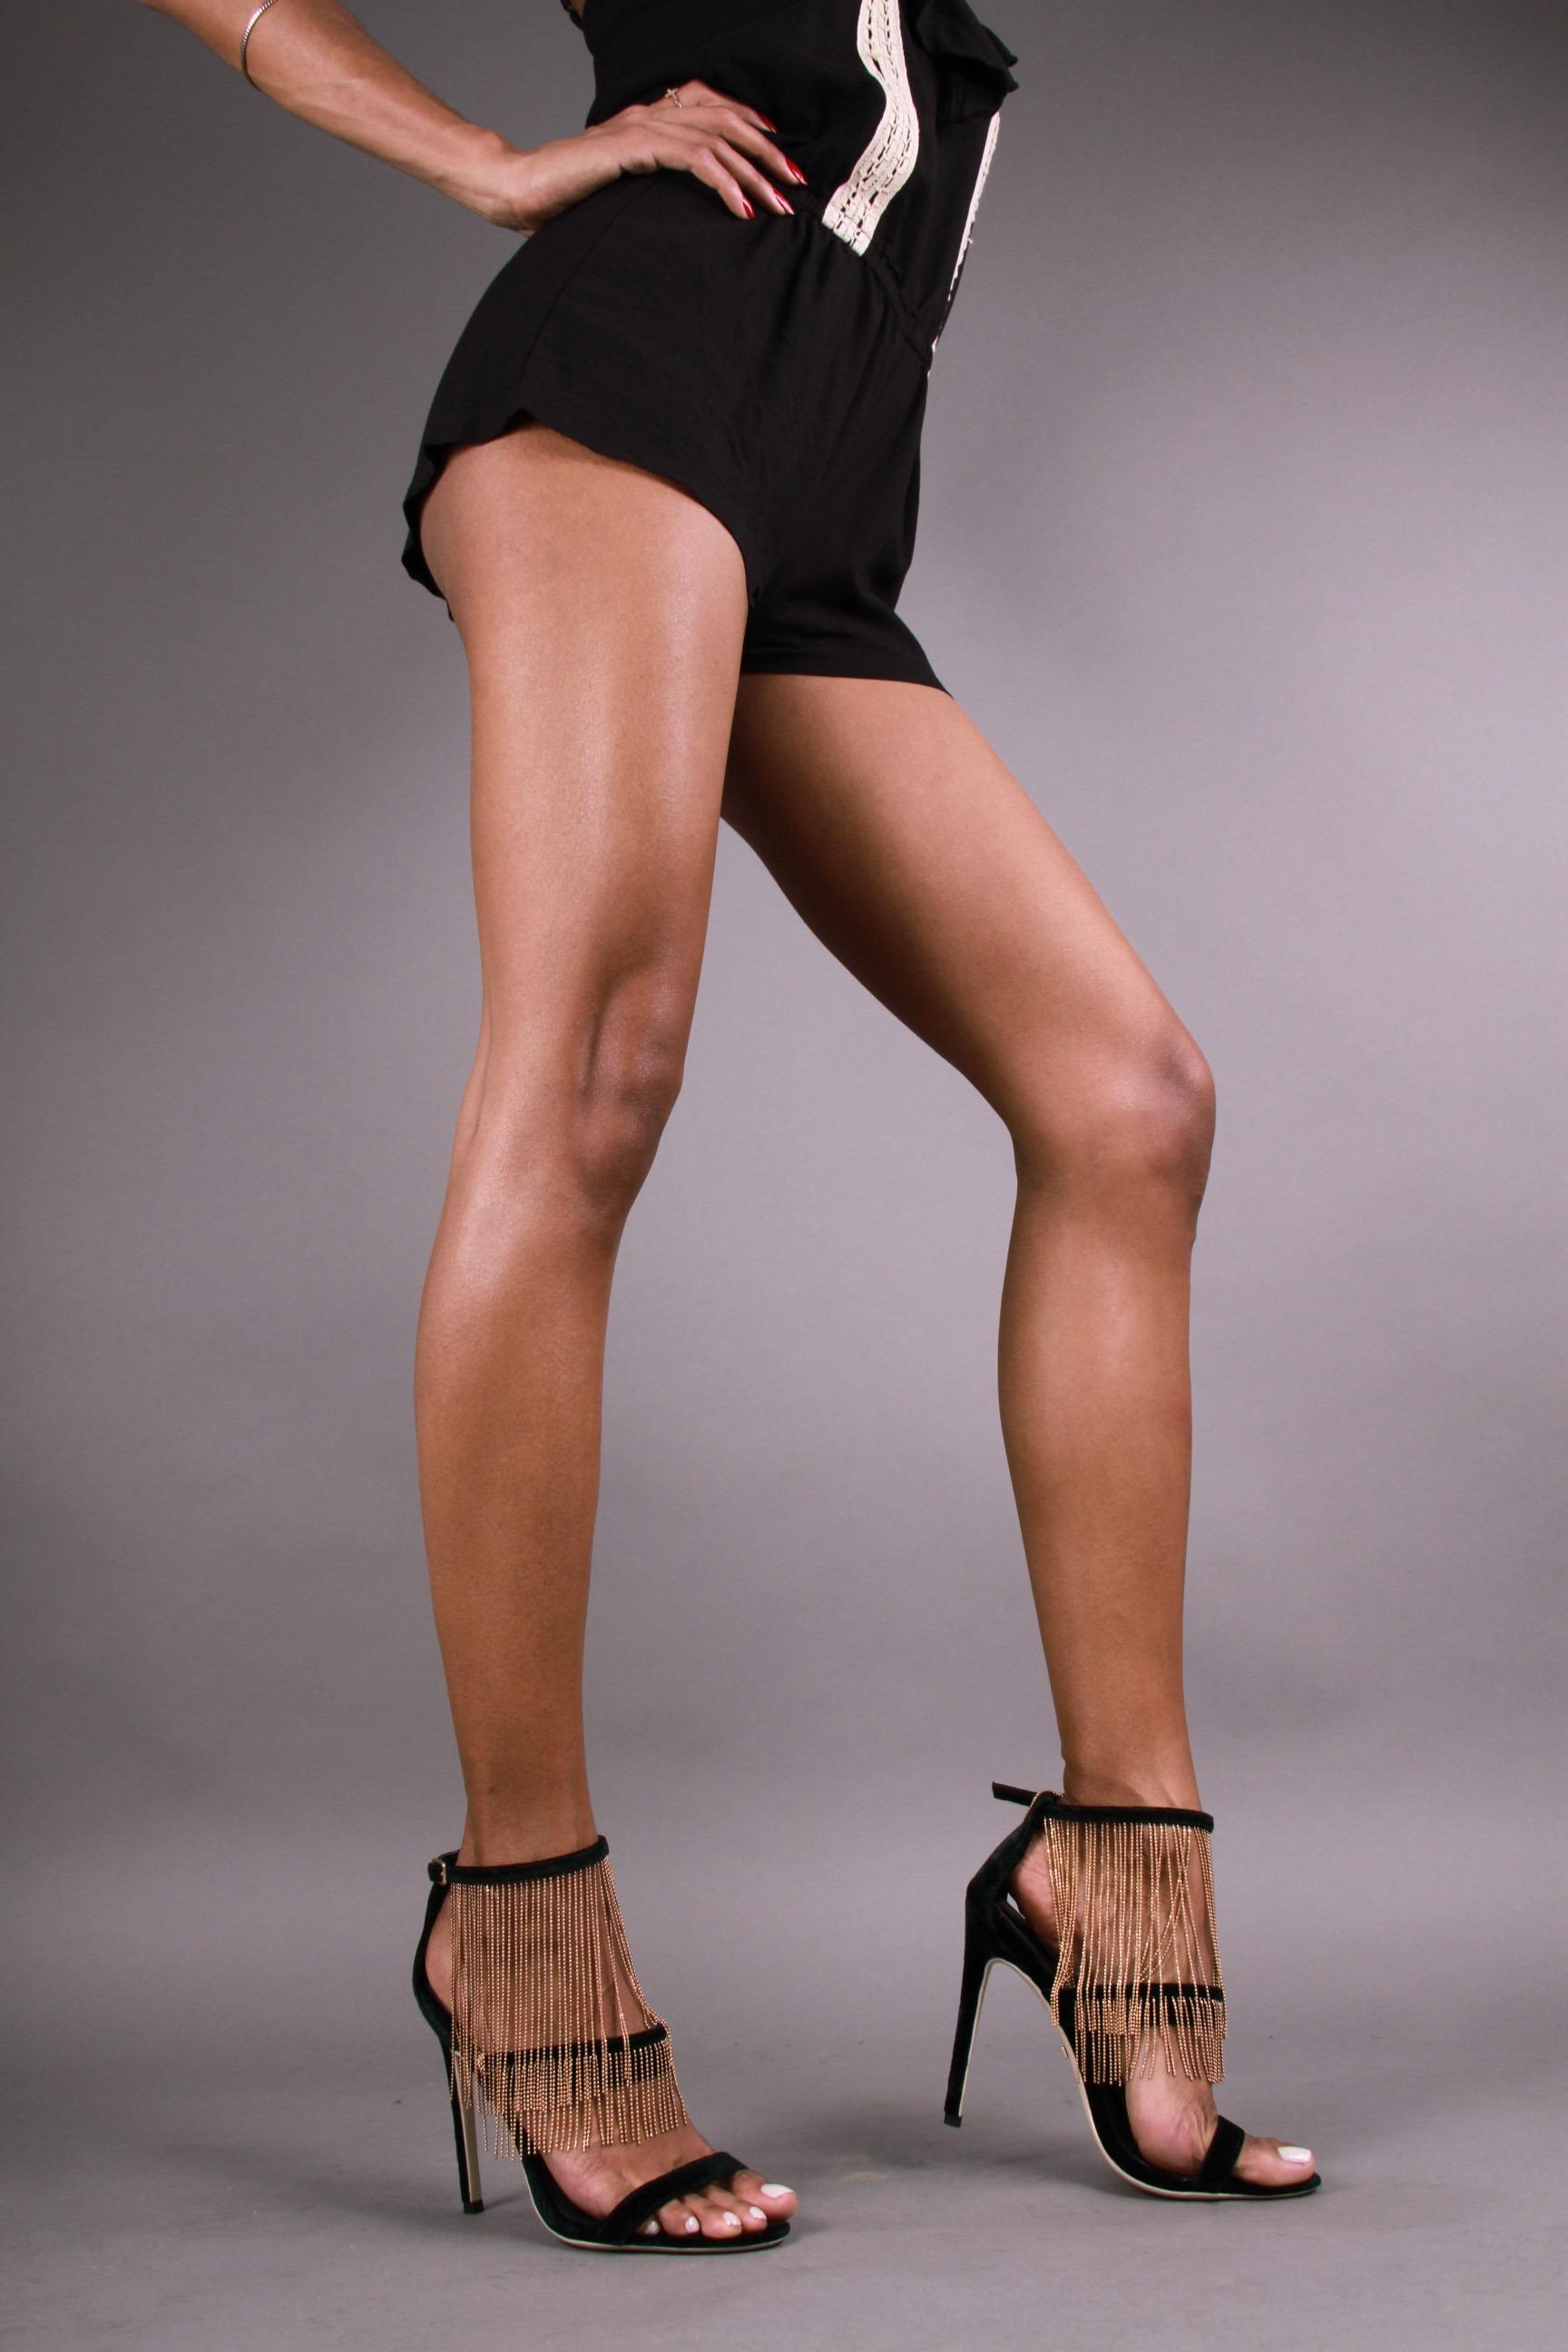 Elizabeth Grullon_Legs8